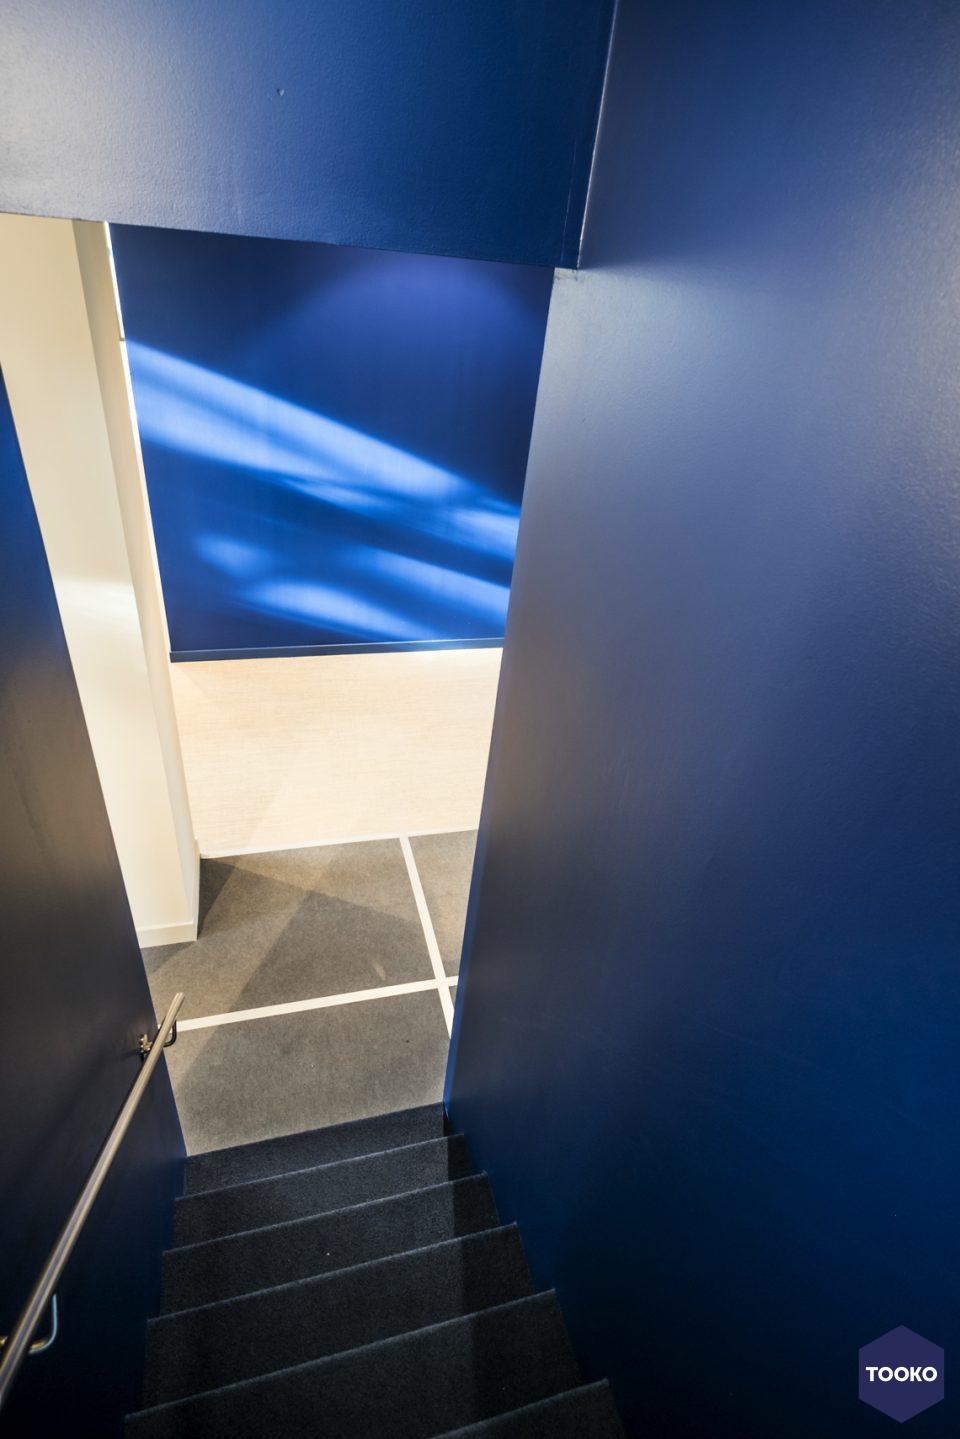 Studio Kees Marcelis - Zorginstelling Vincent van Gogh Instituut